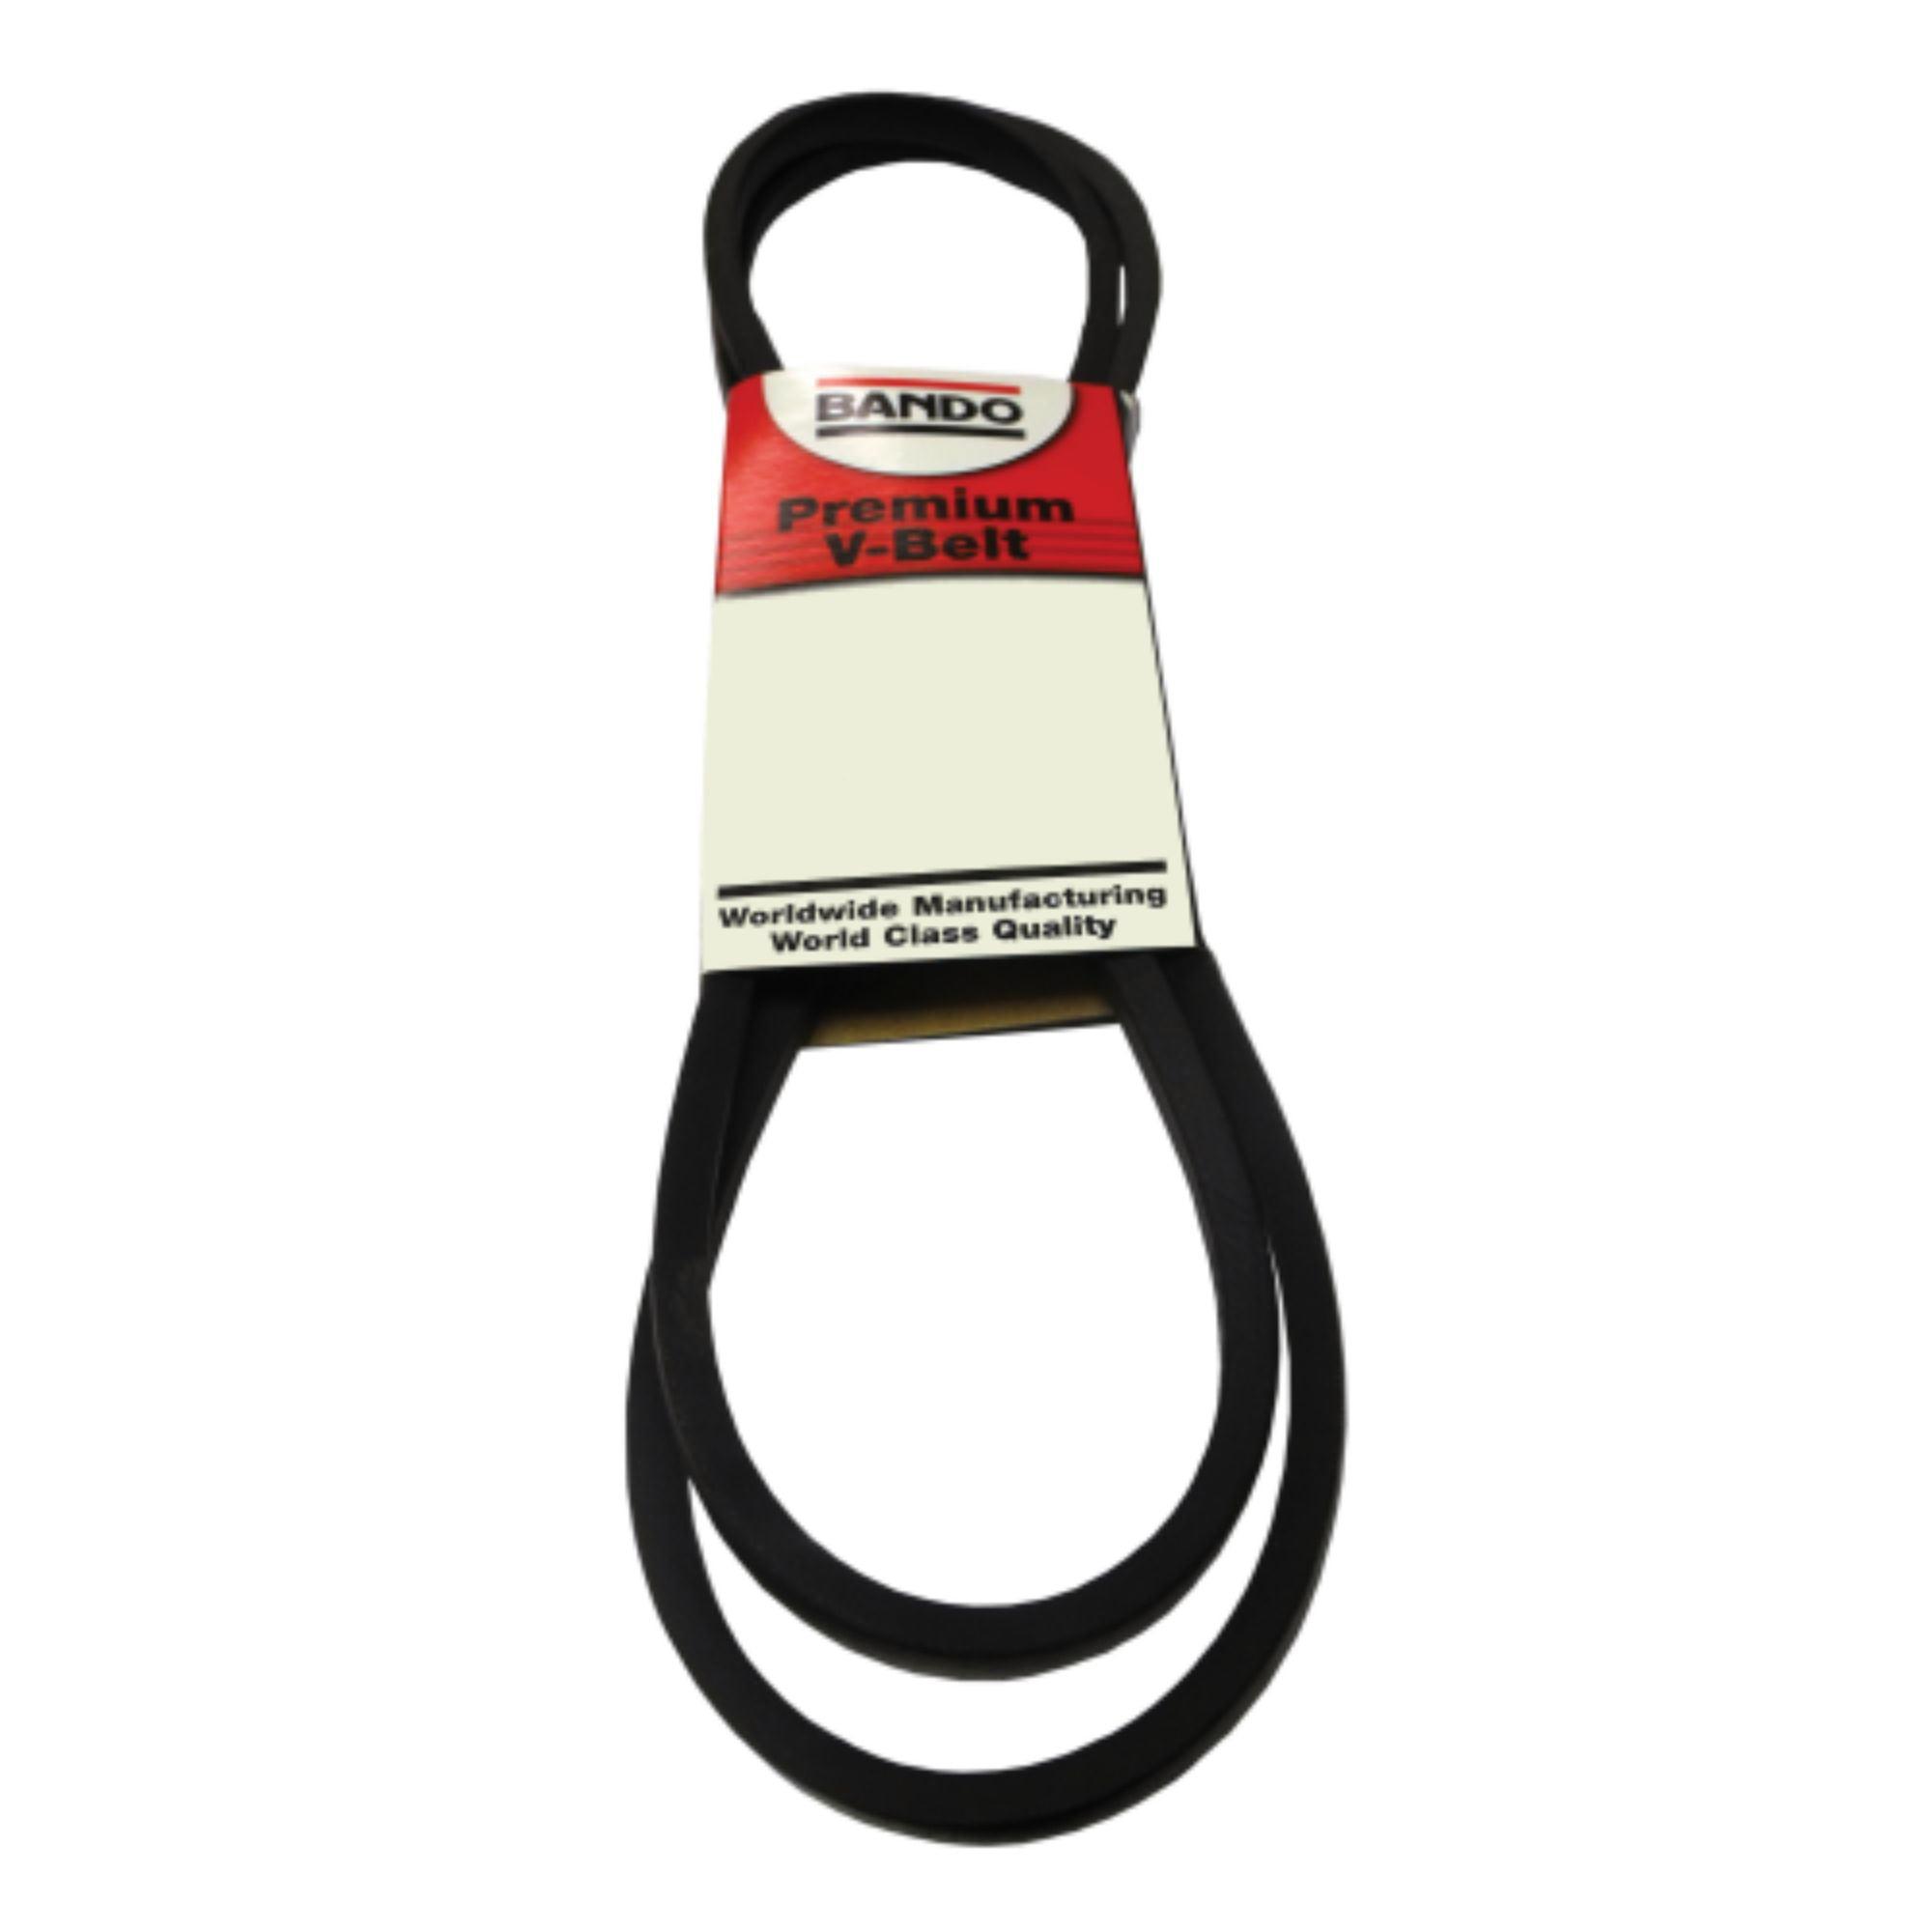 "Bando B28 Premium 31"" Industrial V-Belt"